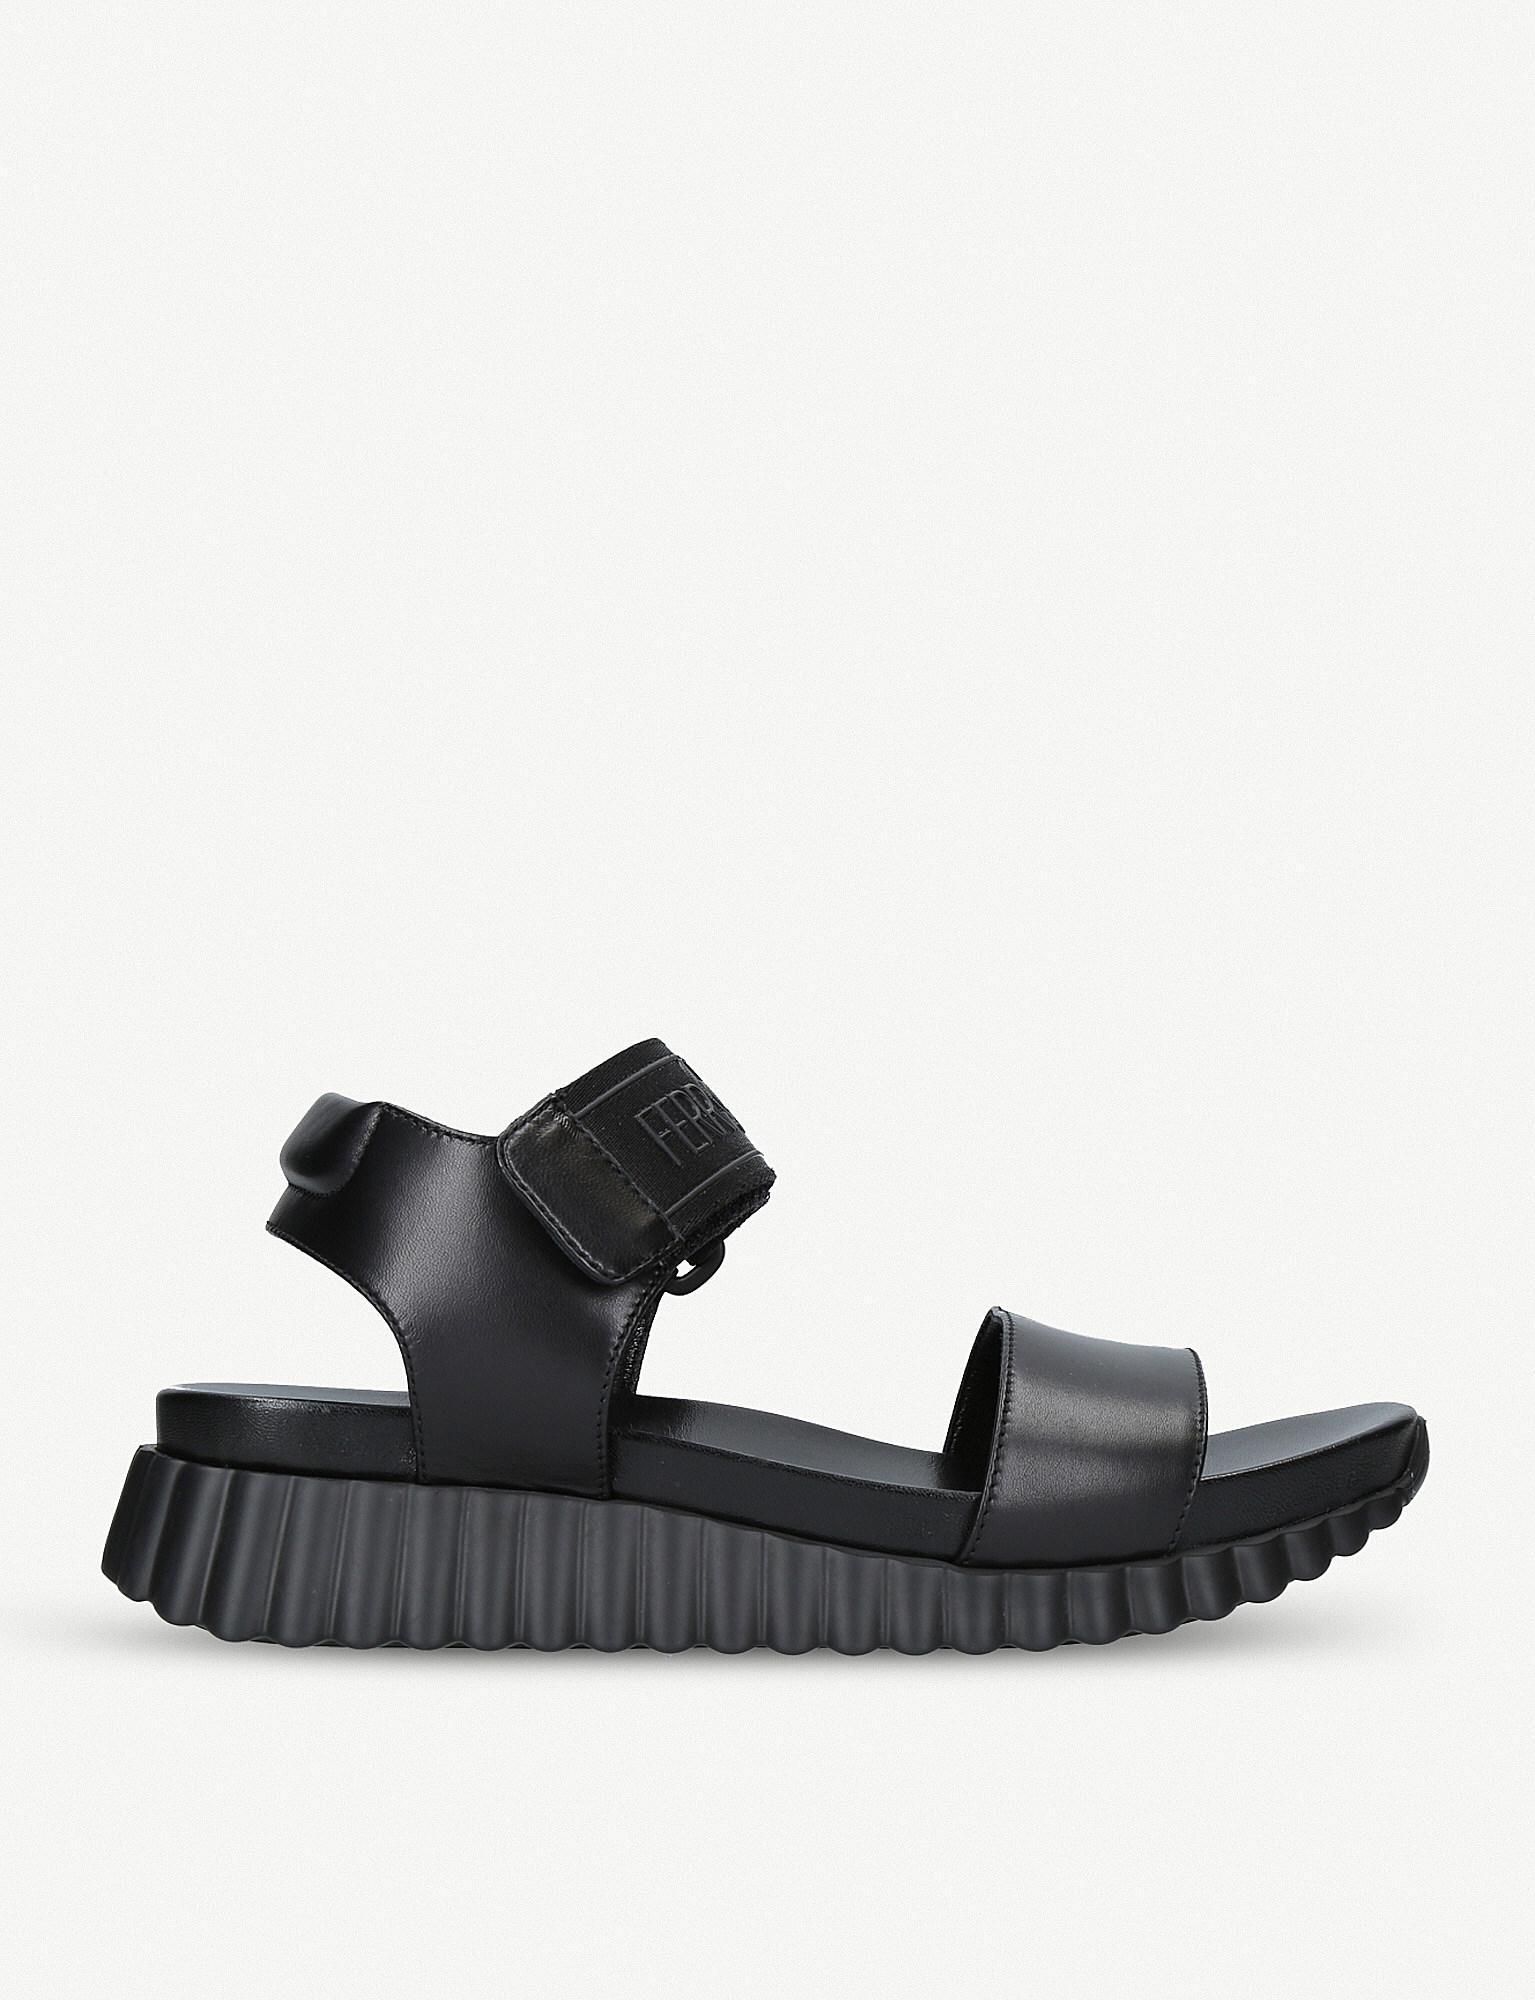 71f261779082 Ferragamo Sabaudia Open-toe Leather Sandals in Black for Men - Lyst